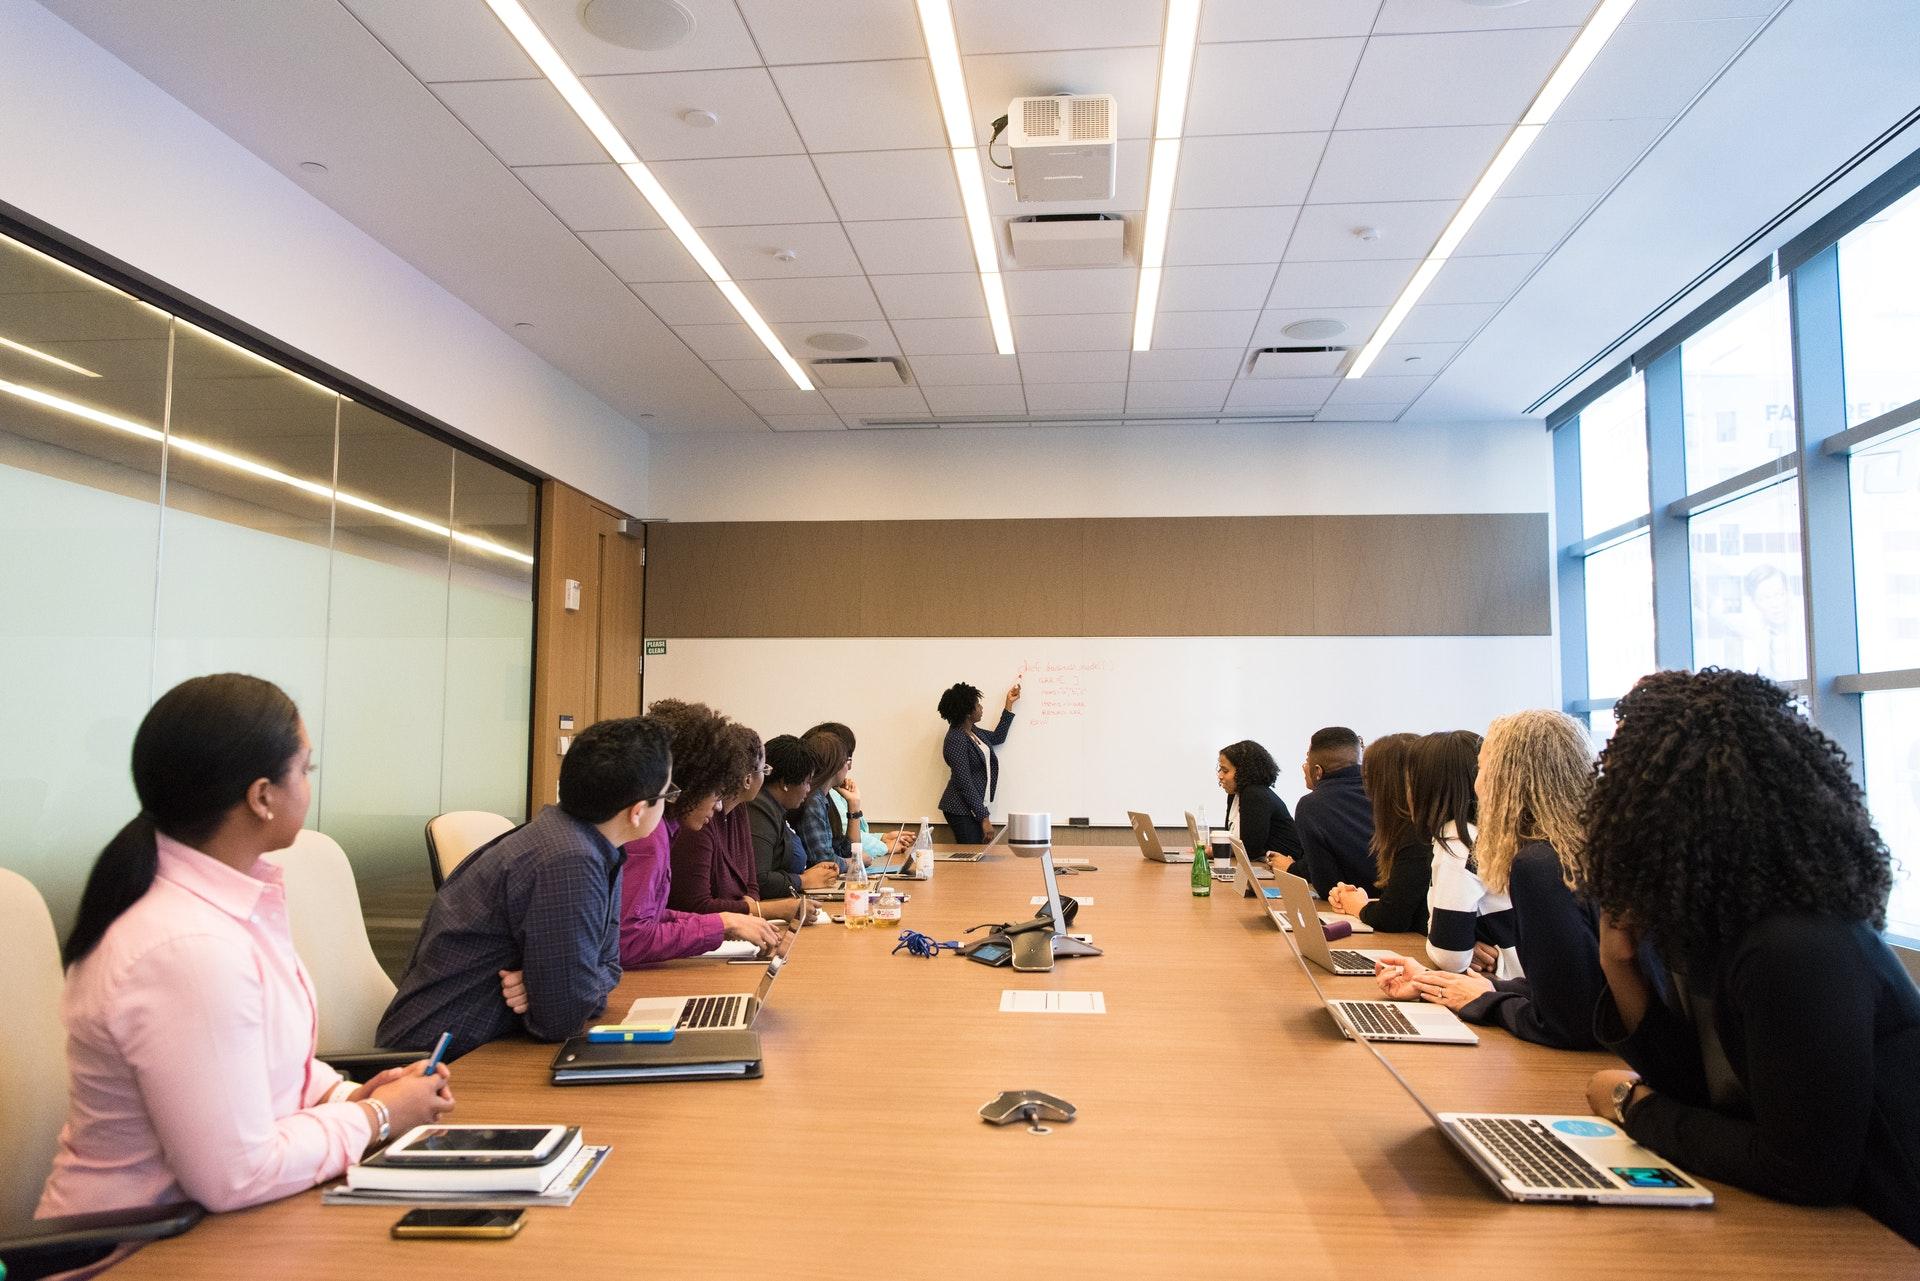 6 Top Profitable Large Scale Business Ideas